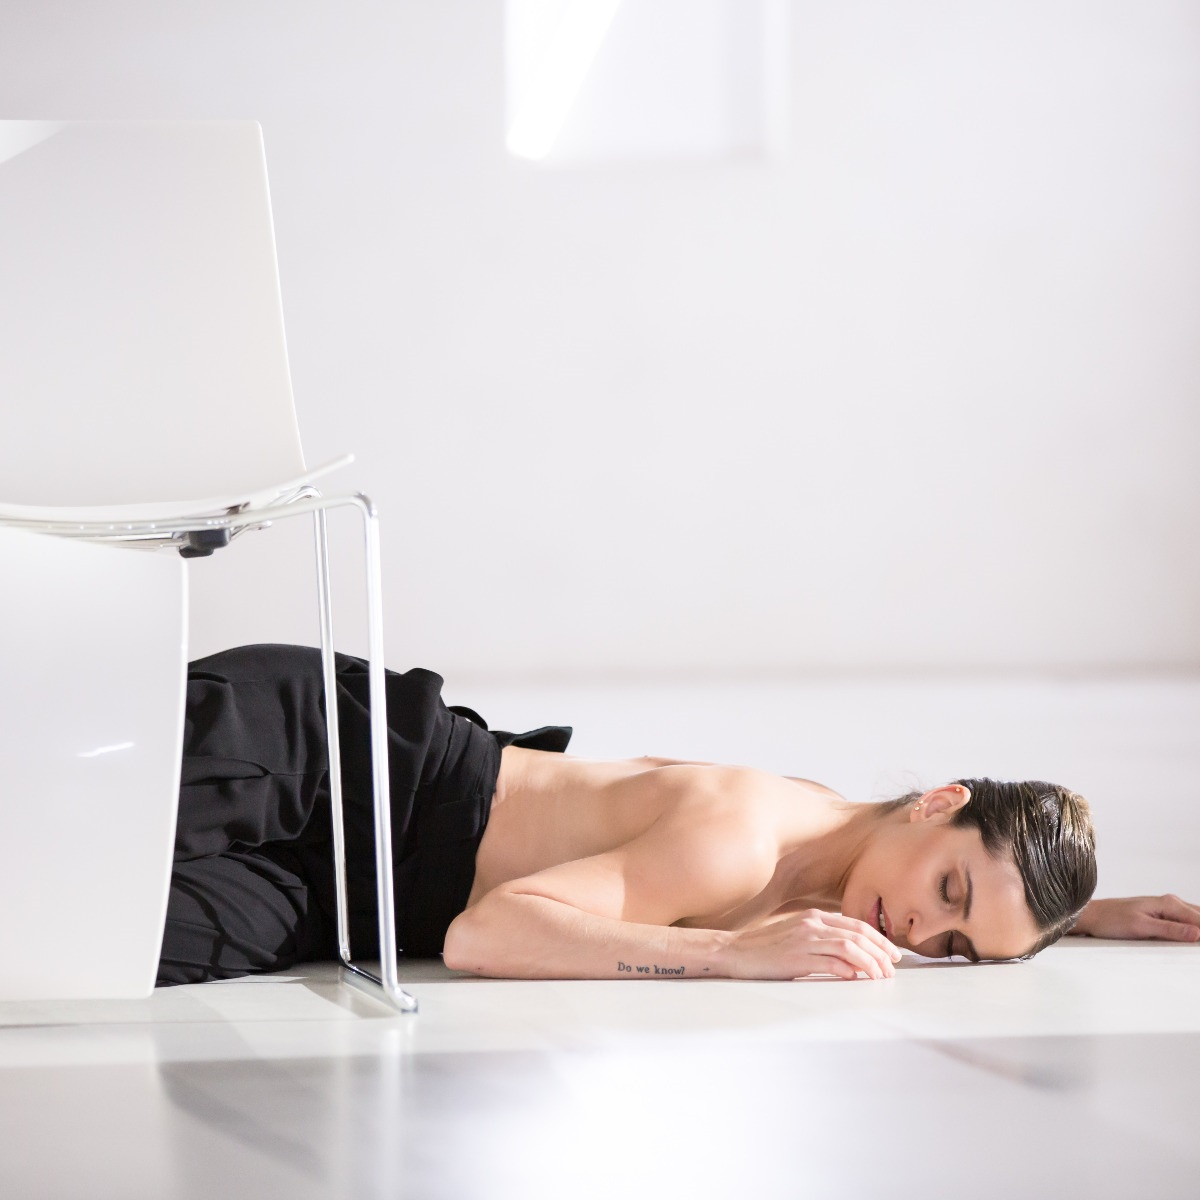 Gauthier Dance // Theaterhaus Stuttgart, The Dying Swans Project